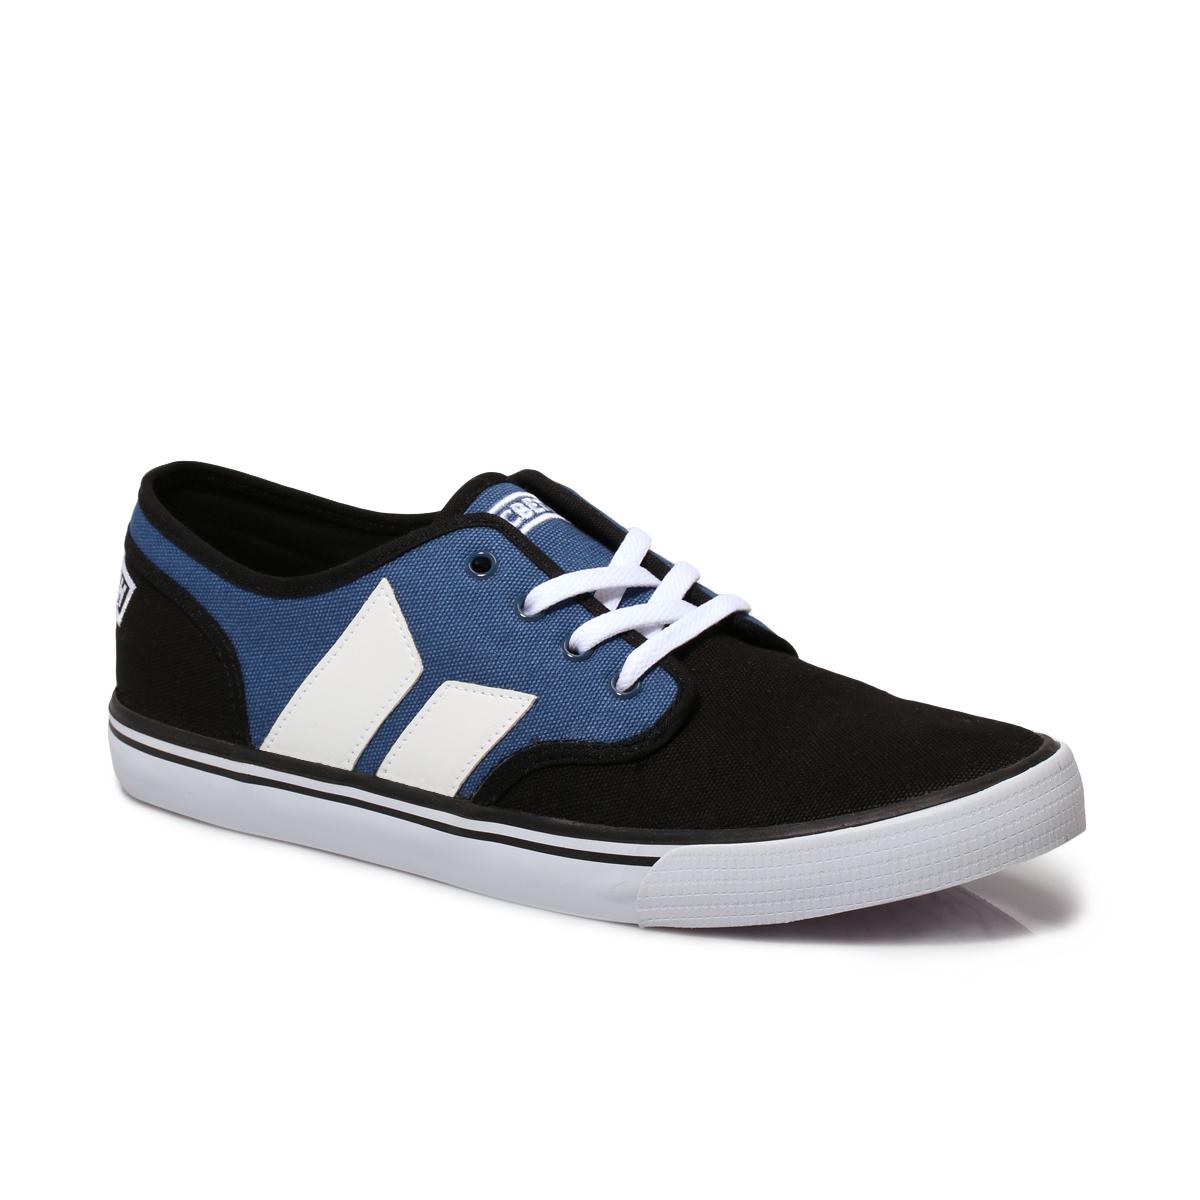 macbeth camo black navy blue canvas mens trainers